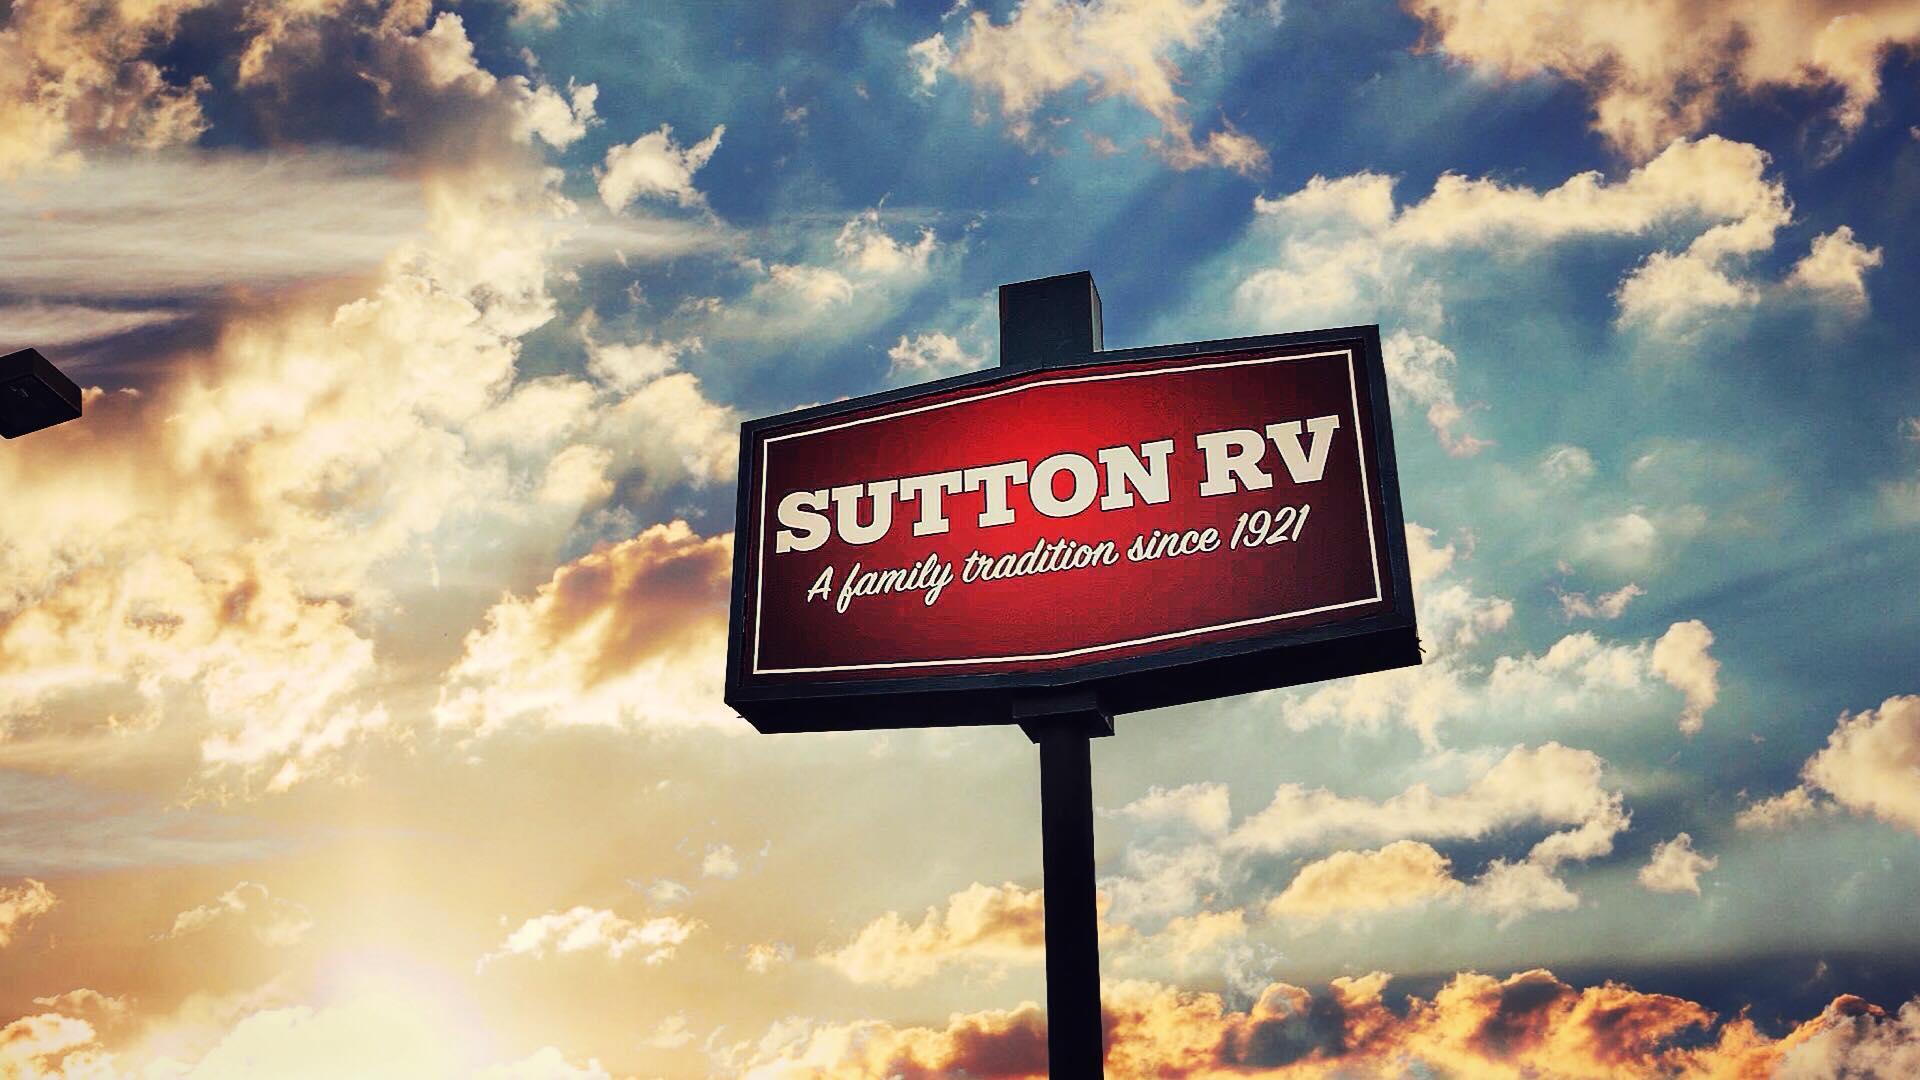 George Sutton RV in Eugene, Oregon